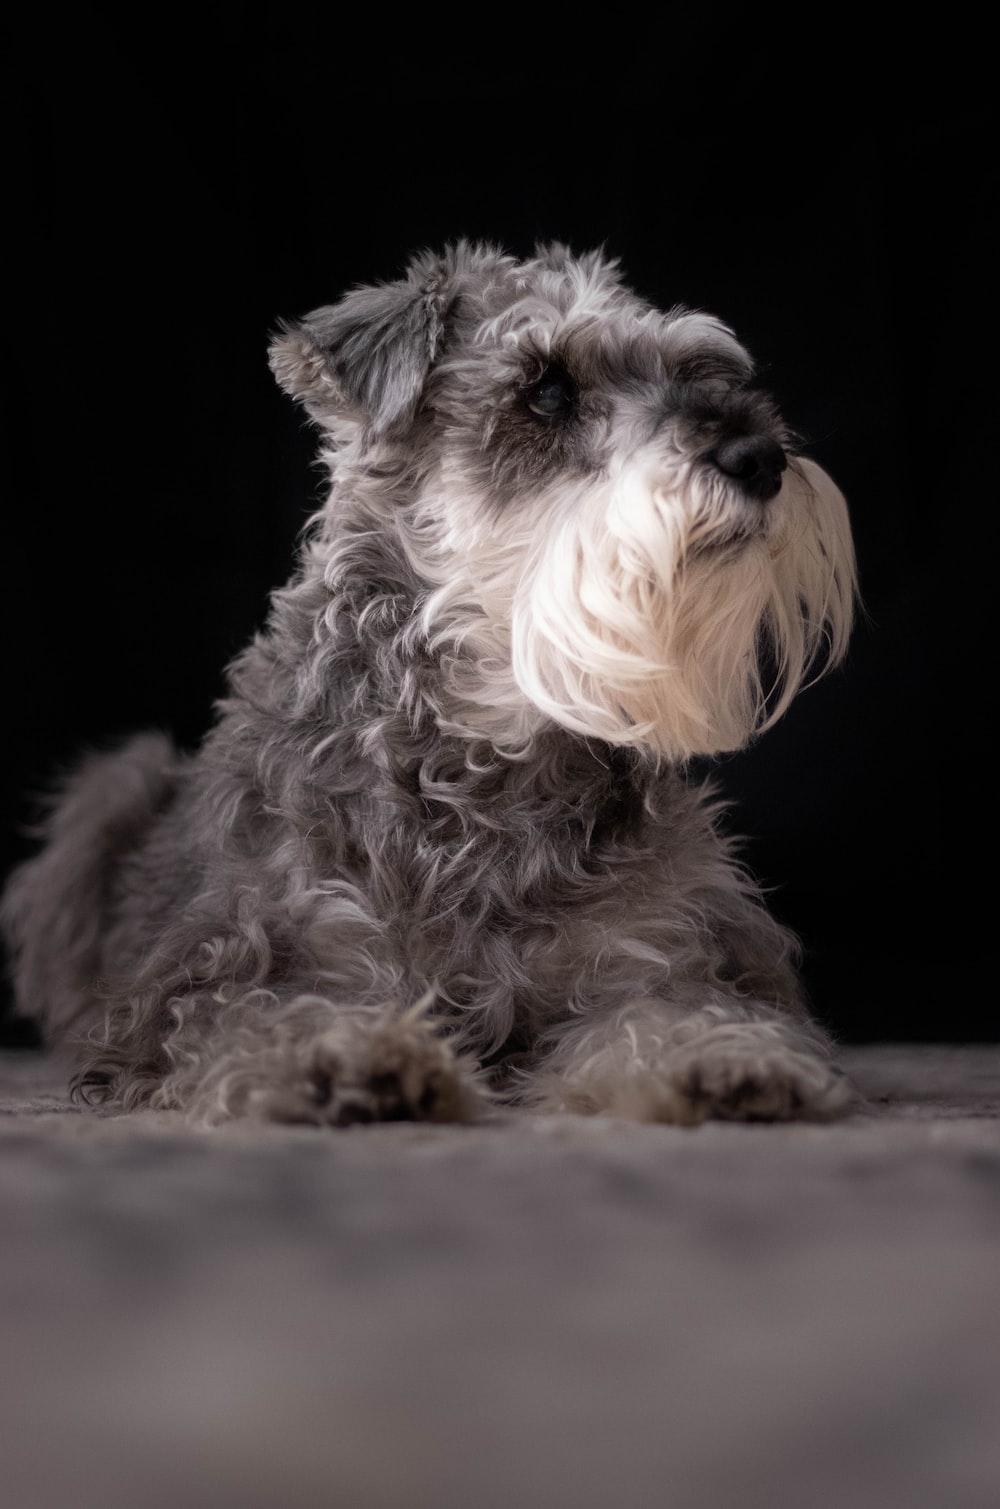 long-coated gray and white dog